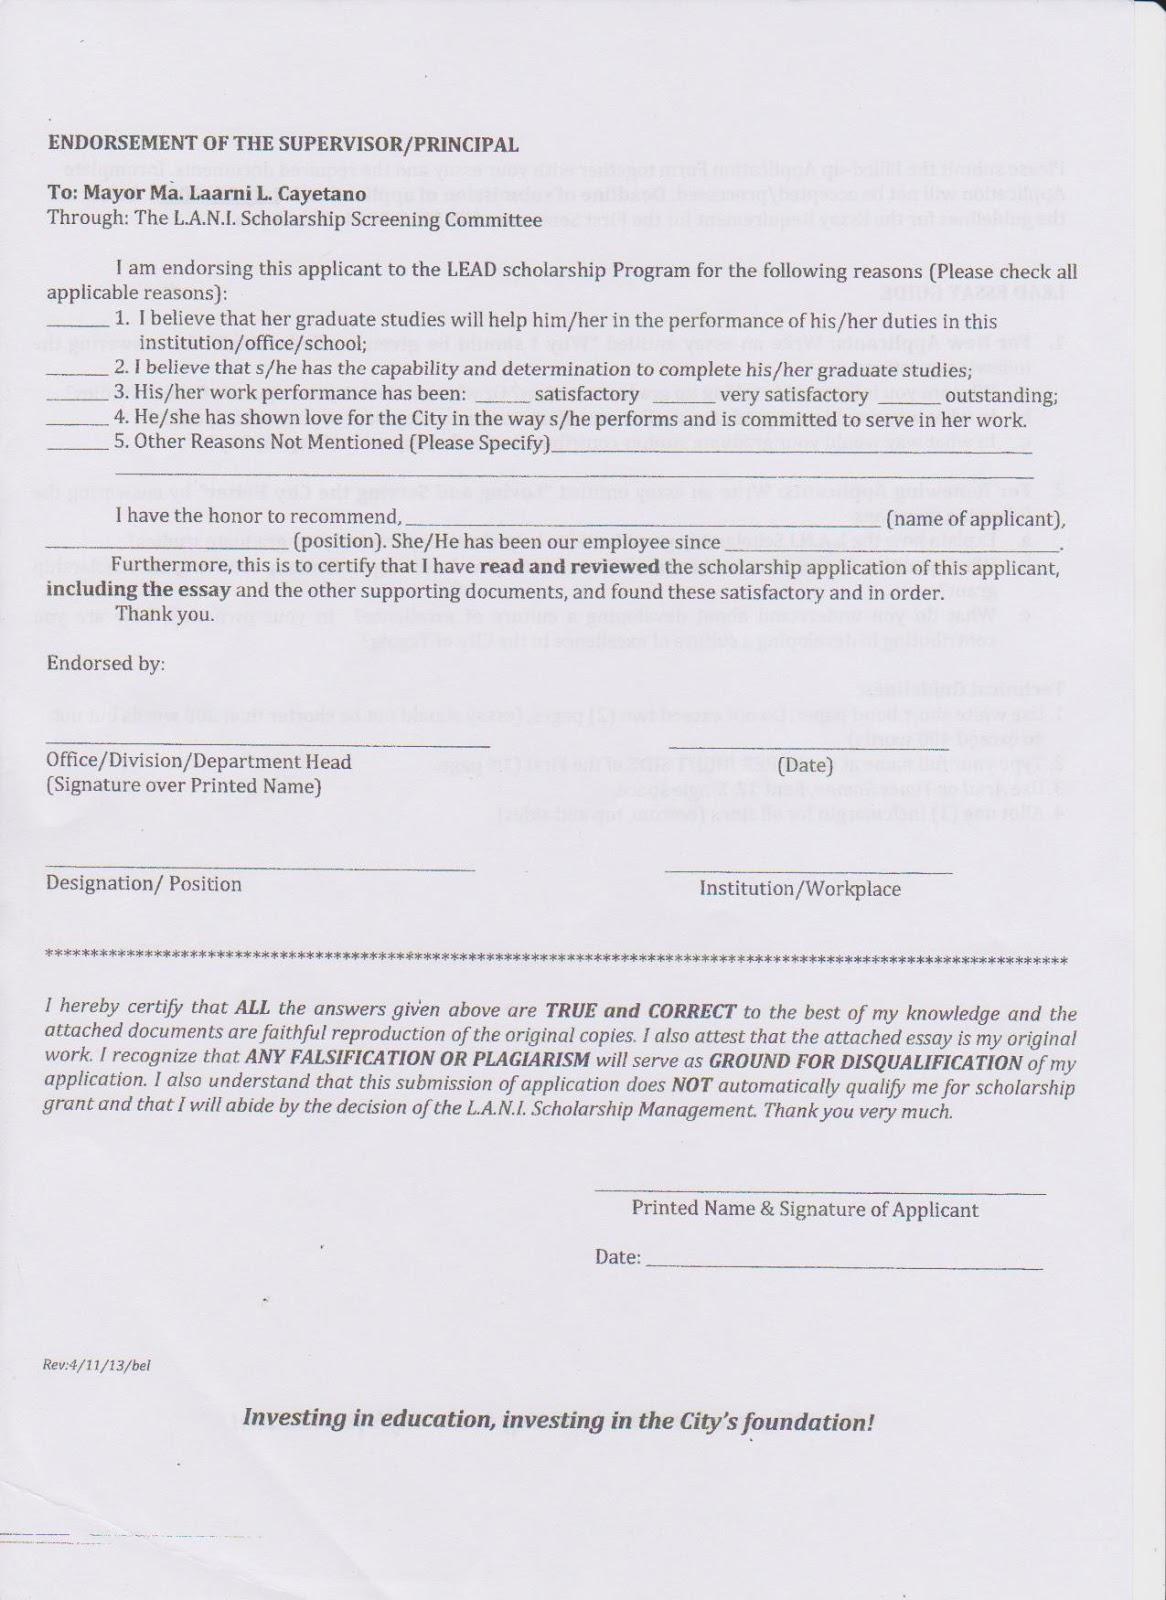 scholarship aplication form